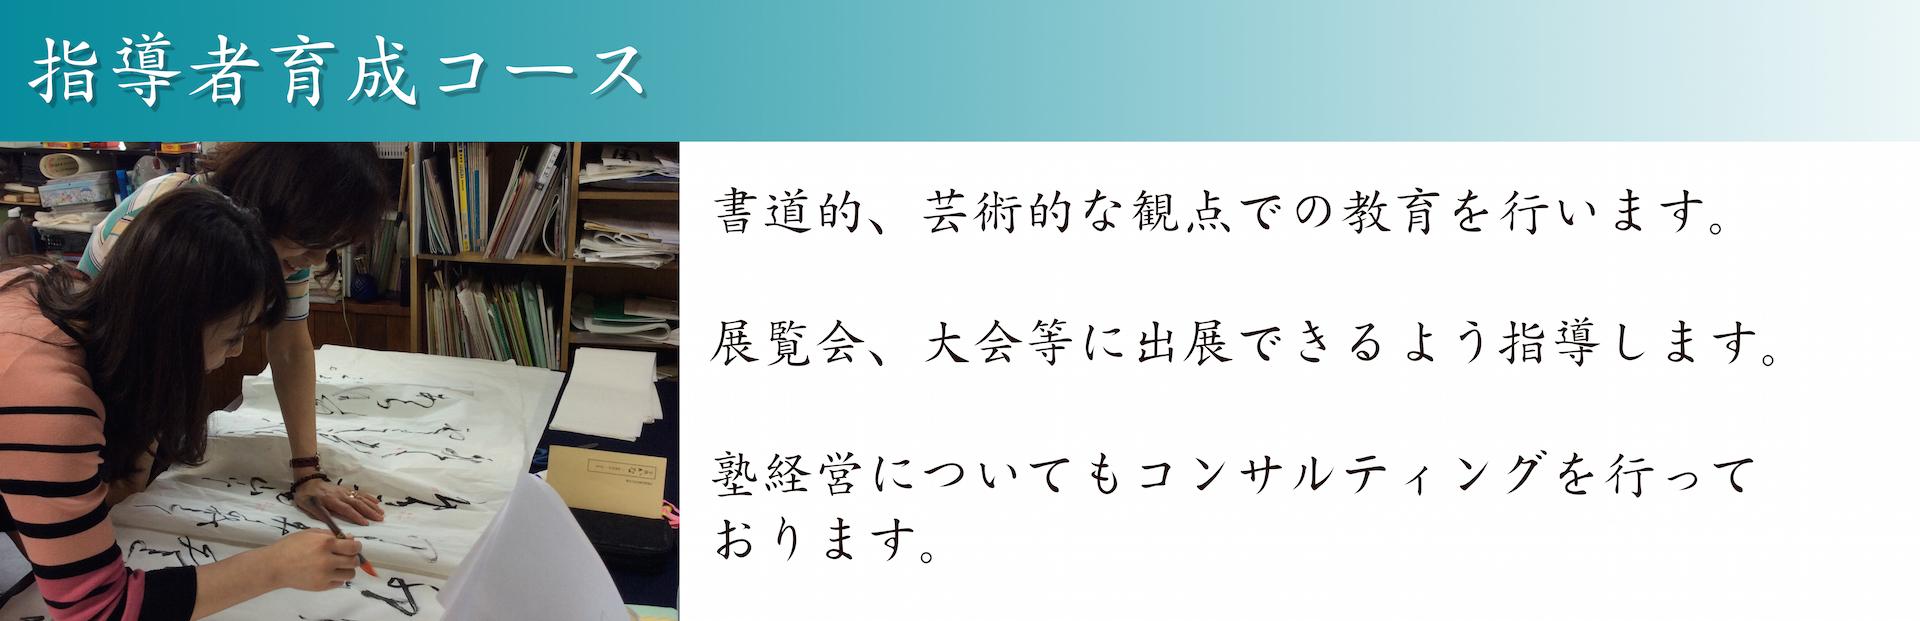 三島市の書道教室房仙会 指導者育成コース